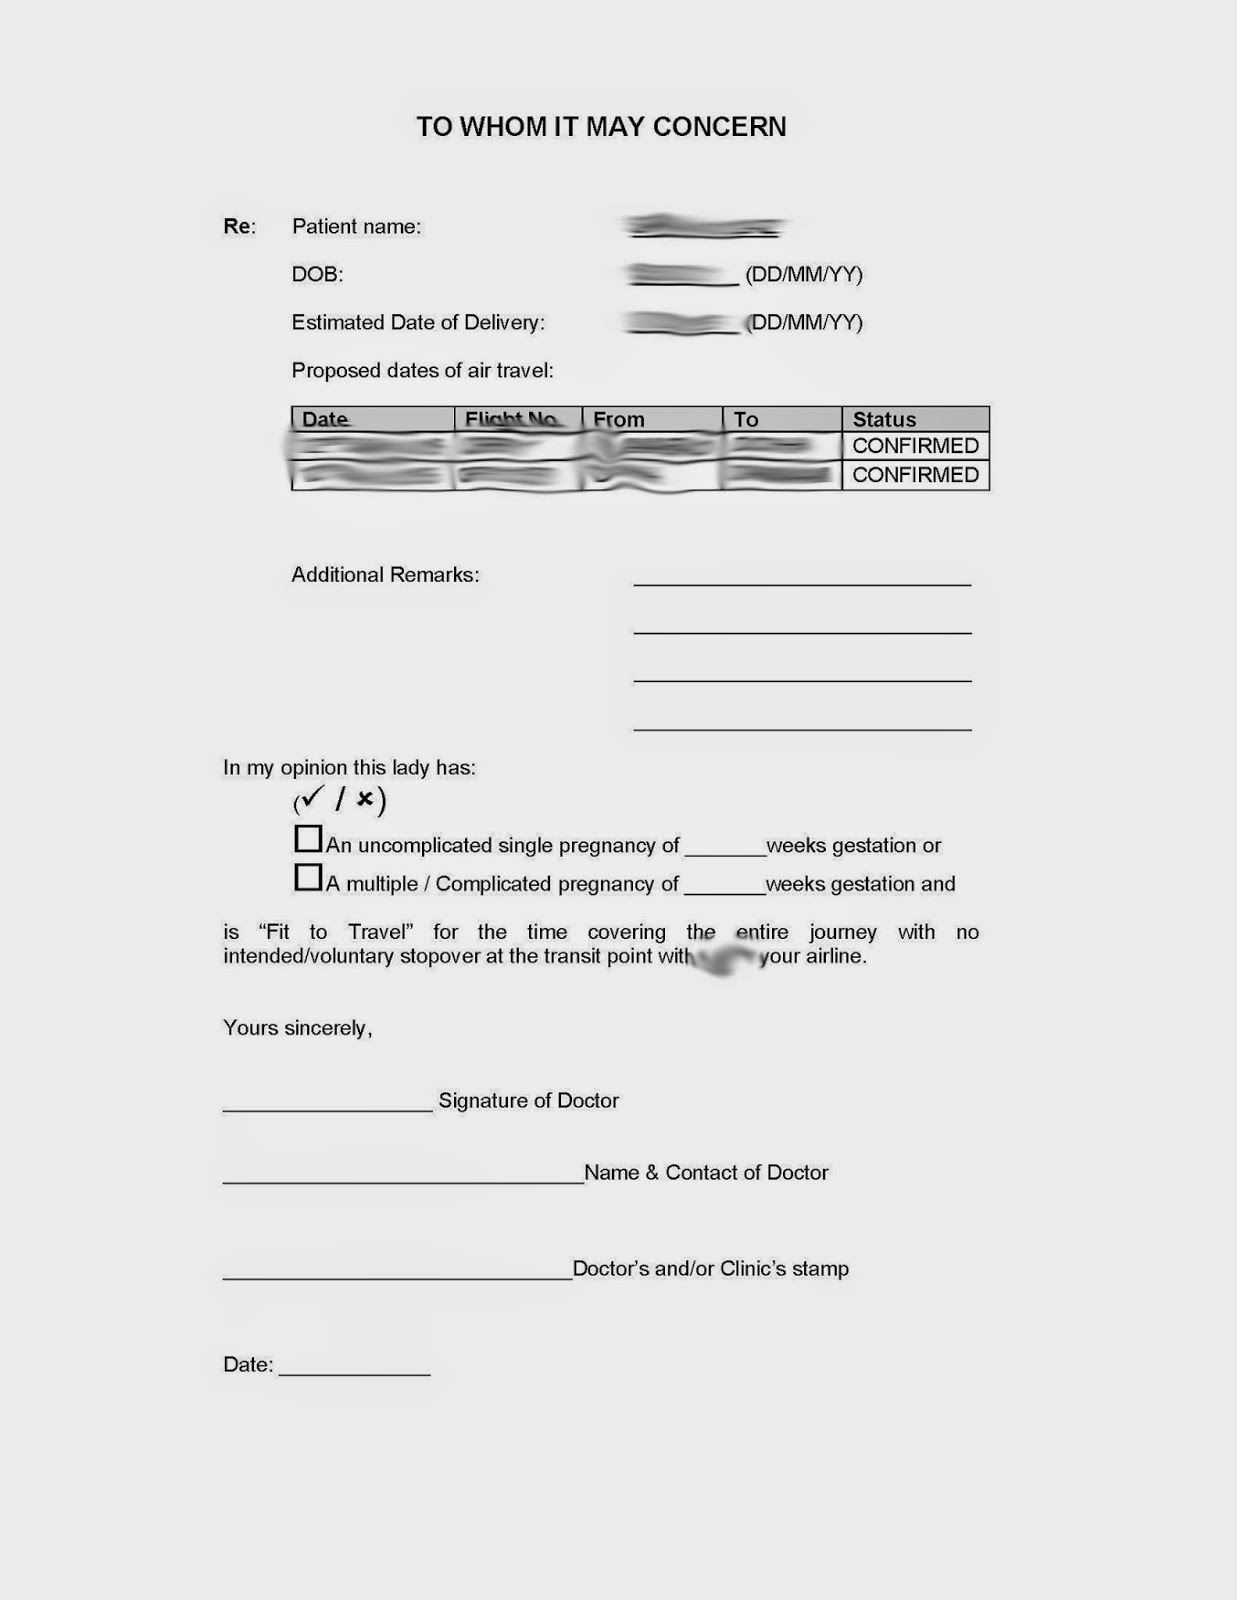 Sample Medical Certificate For Pregnancy Air Travel